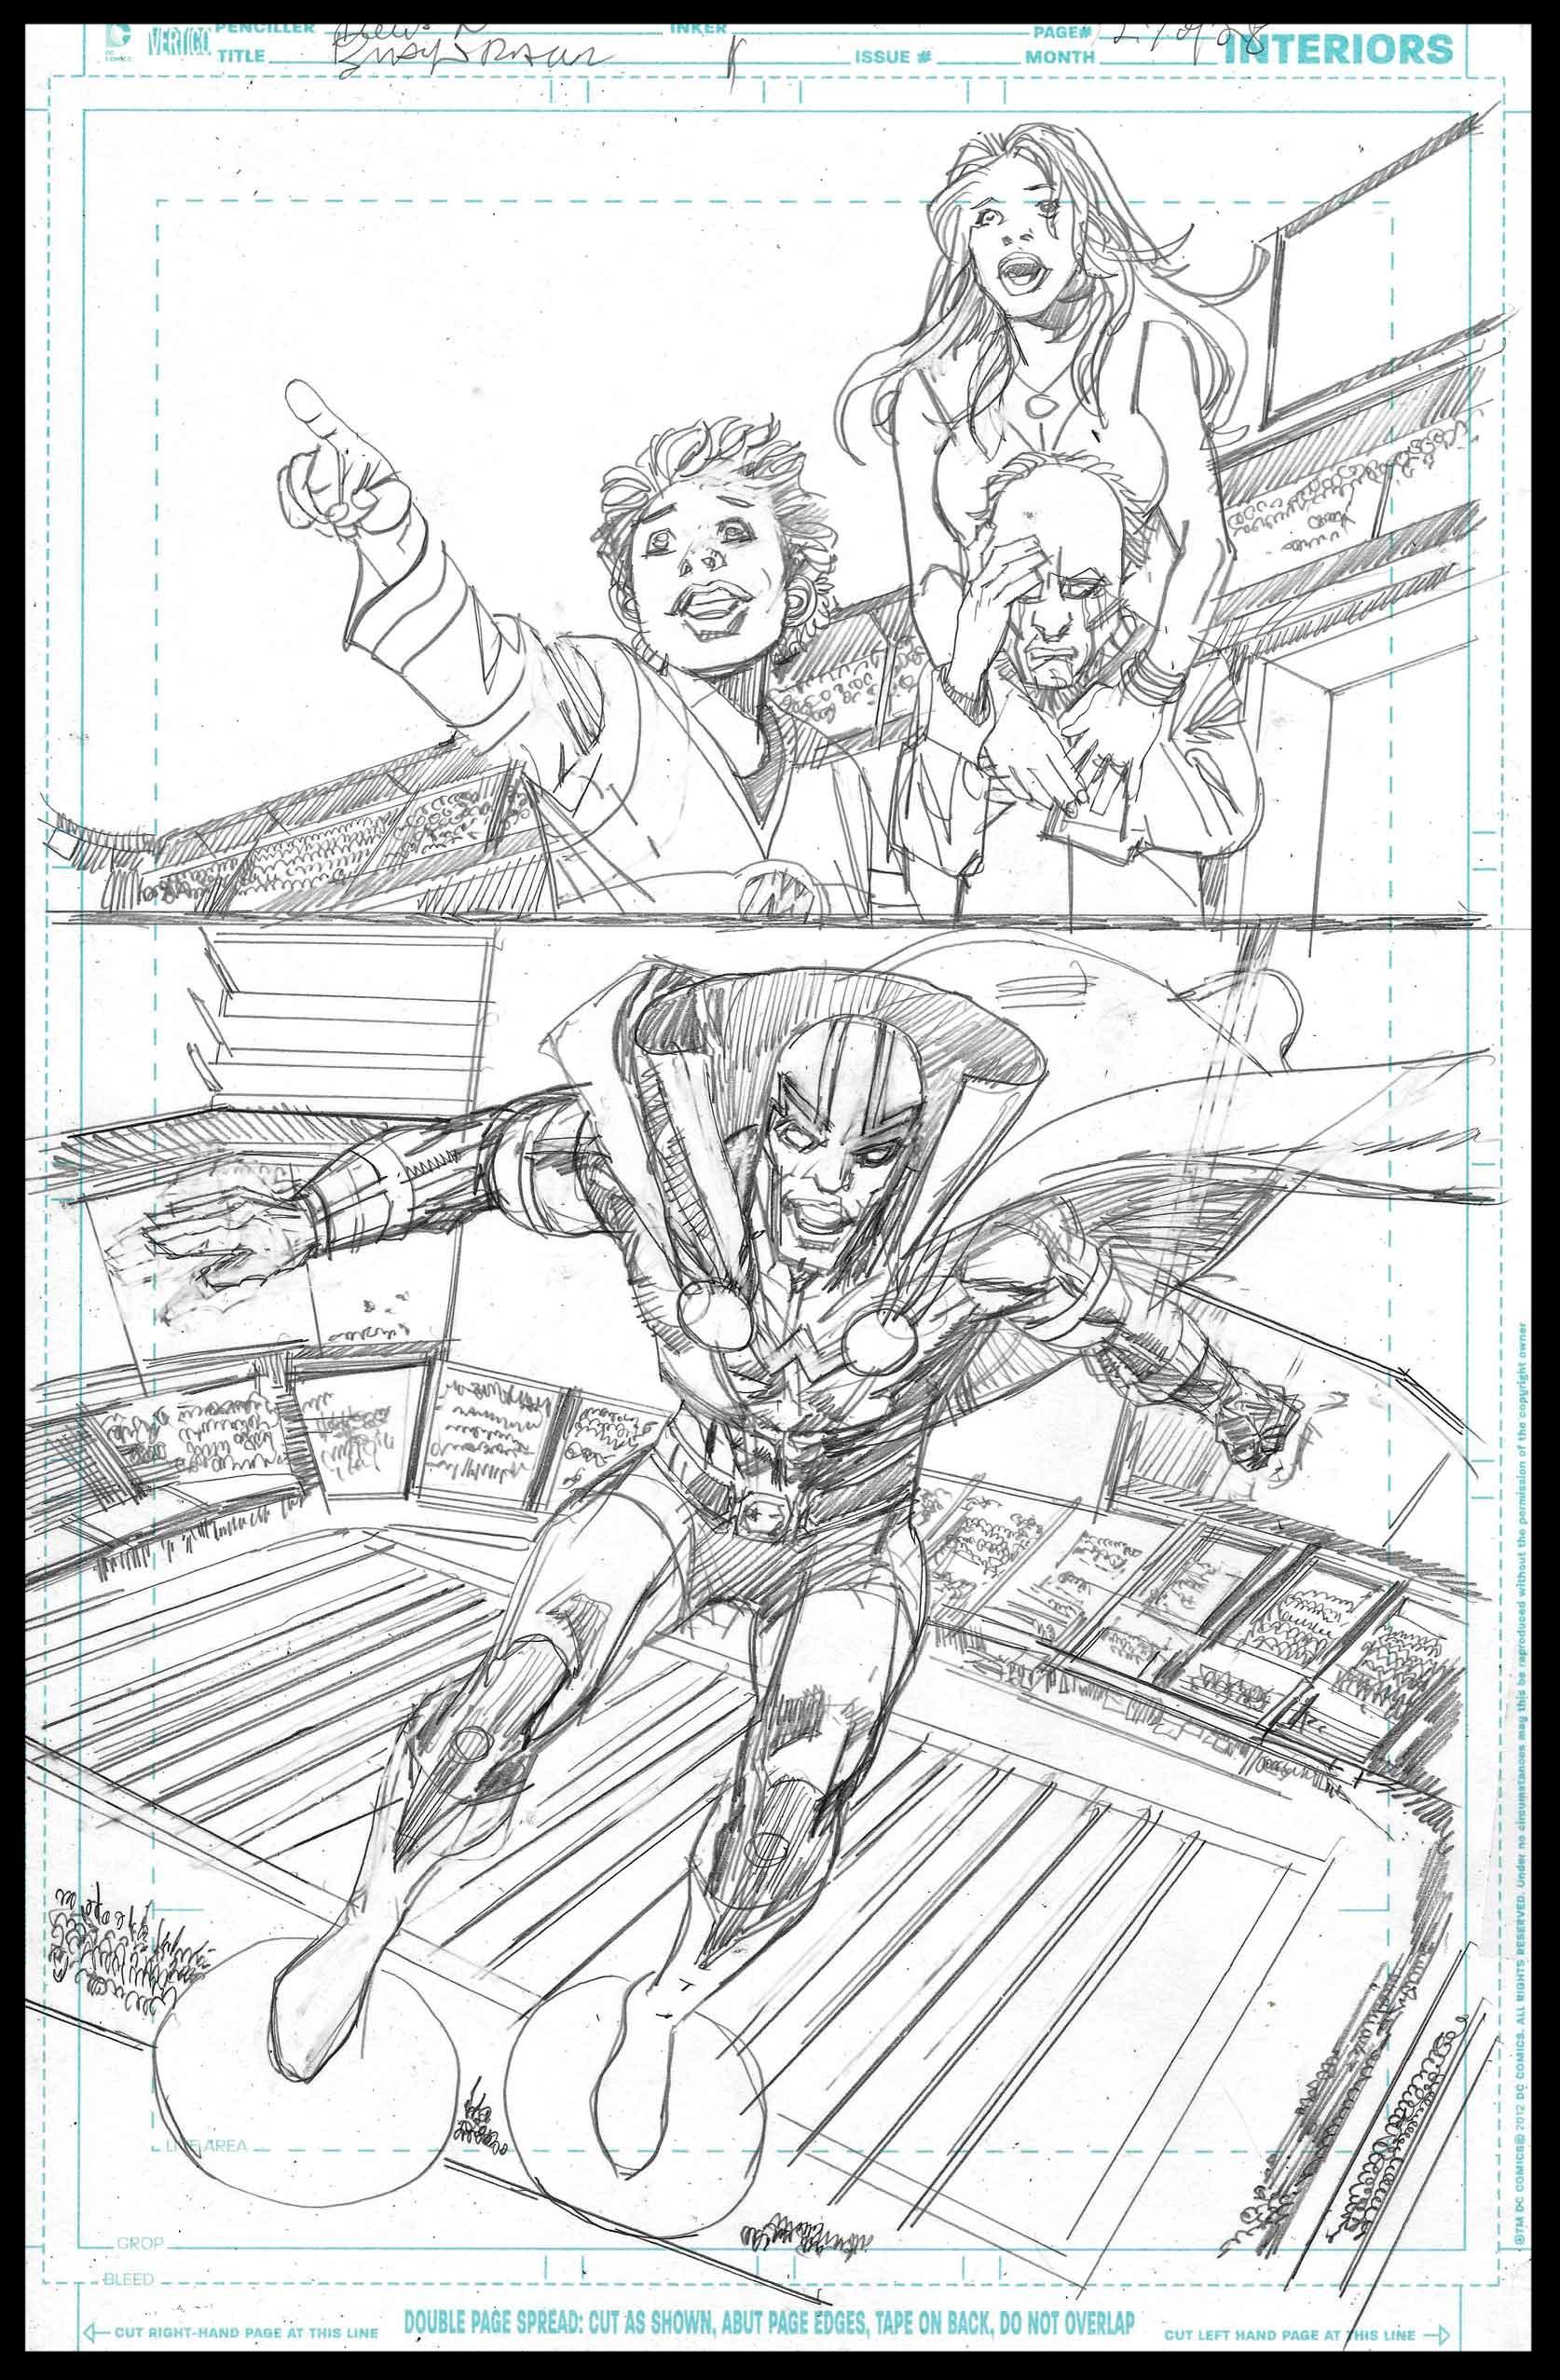 Black Racer #1 - Page 27 - Pencils